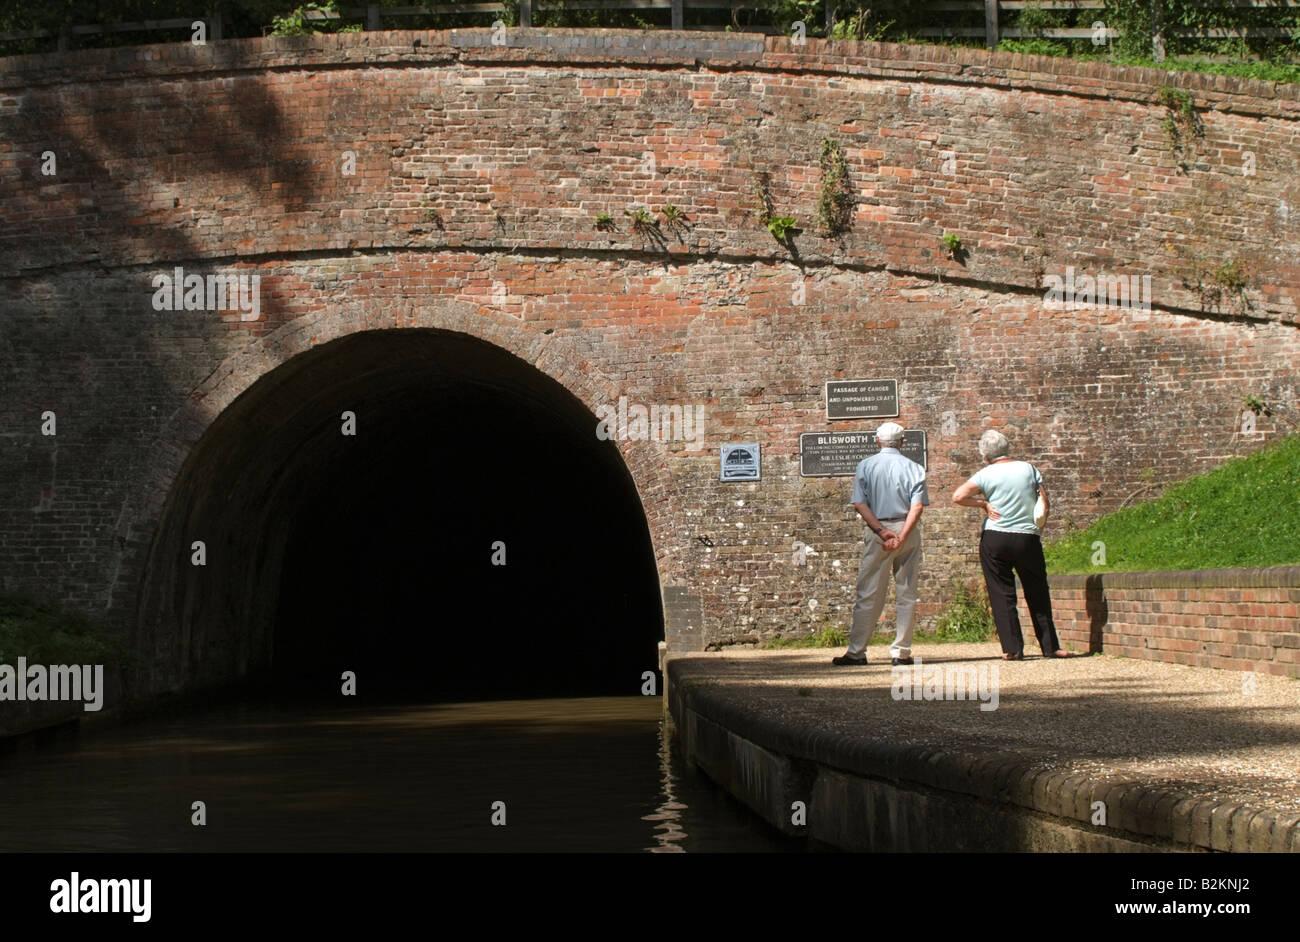 Blisworth Tunnel entrance on the Grand Union Canal at Stoke Bruerne Northamptonshire England UK - Stock Image